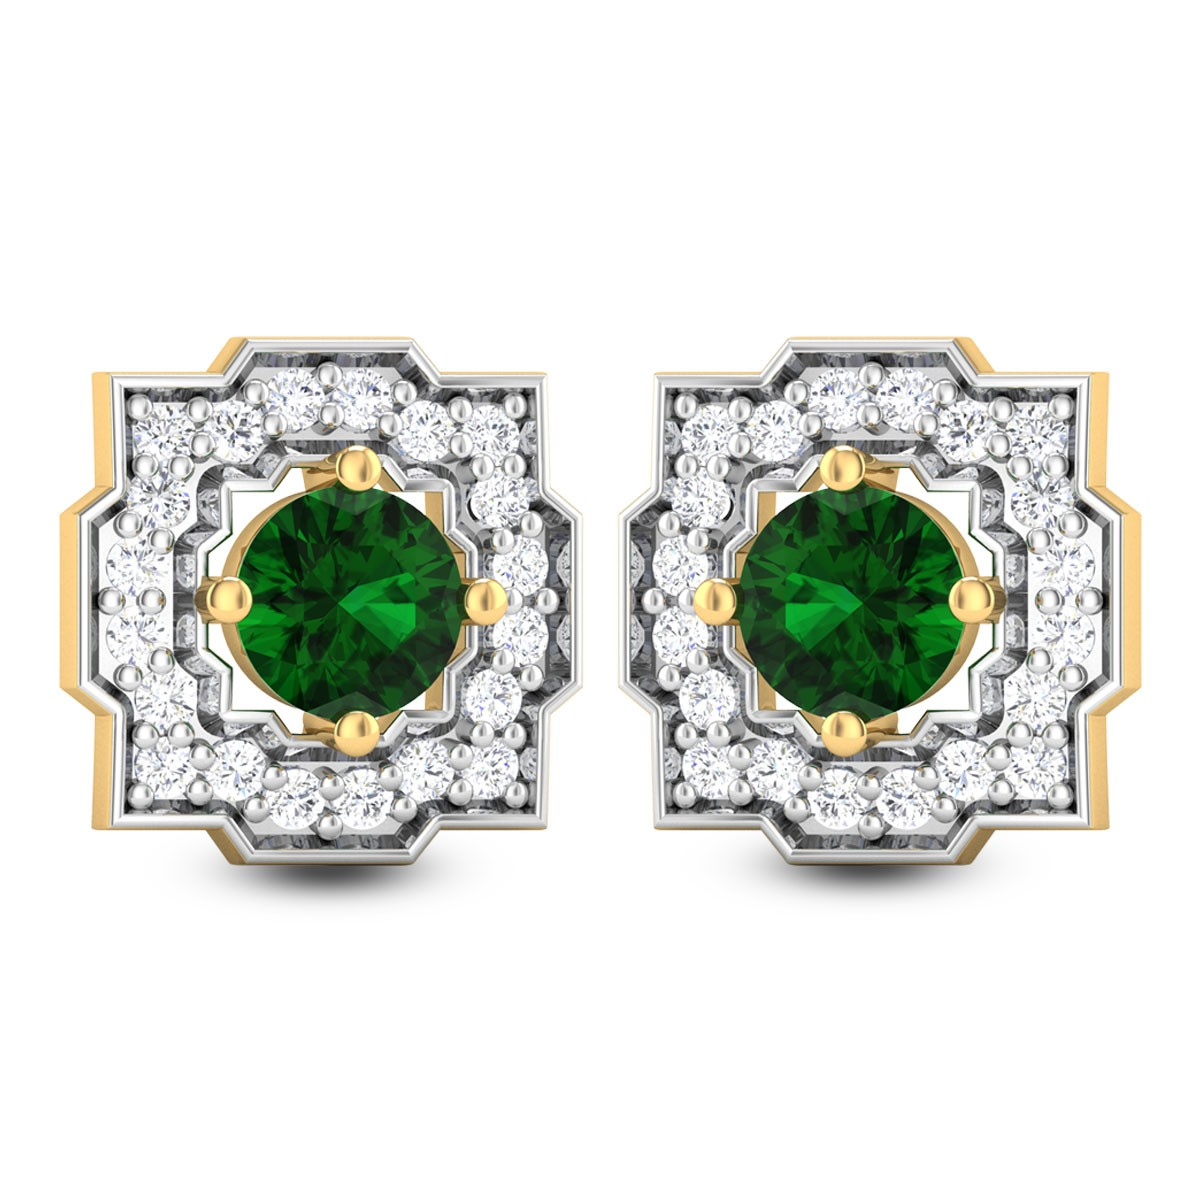 Haima Emerald Stud Earrings